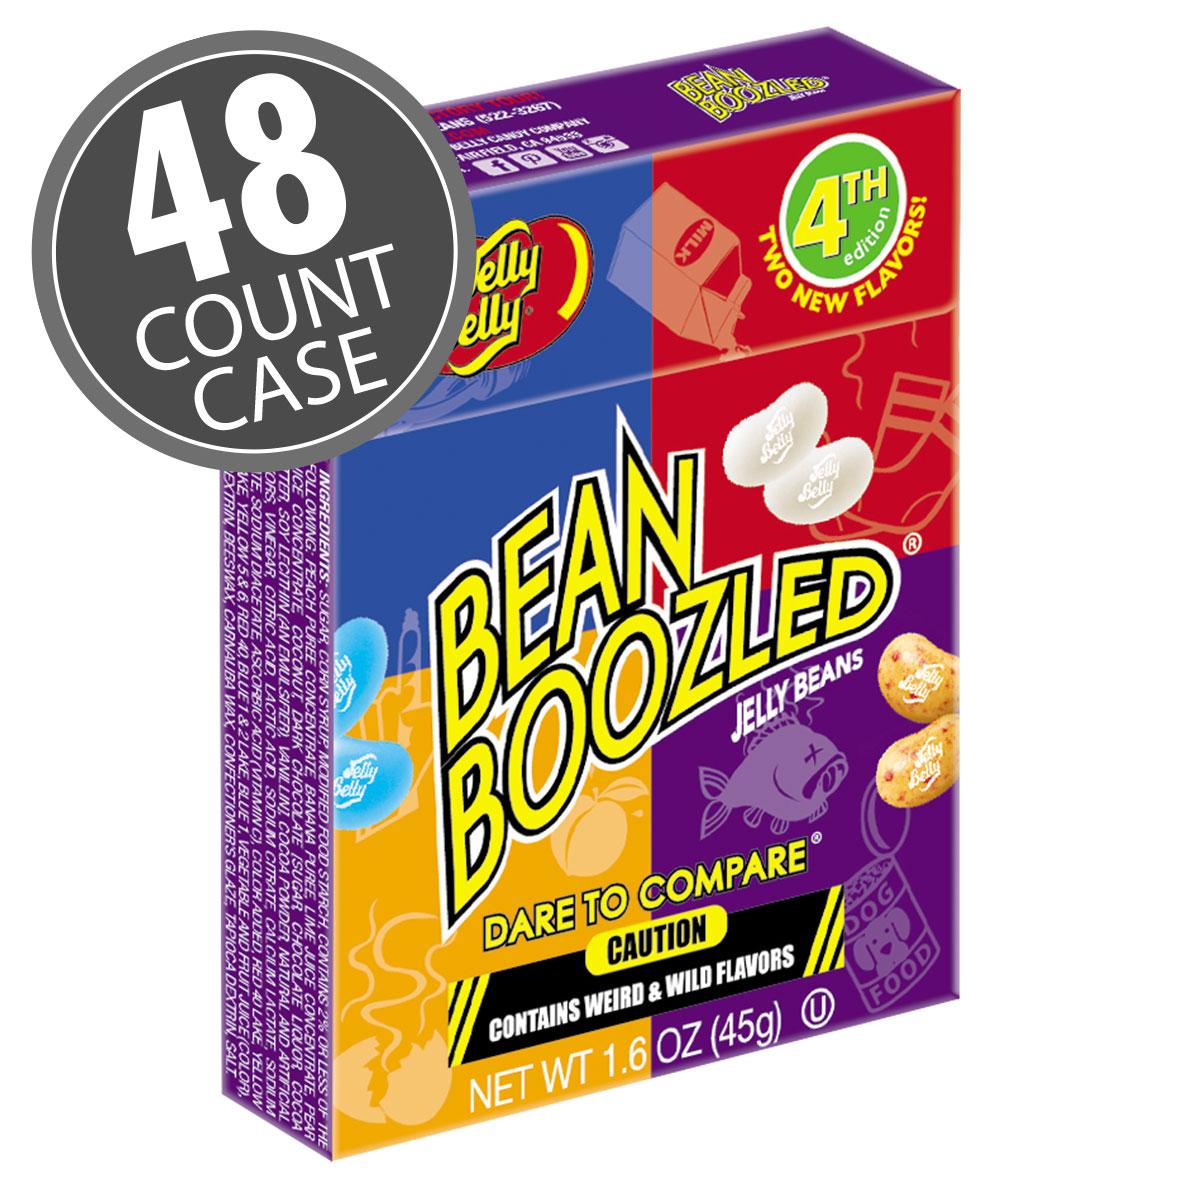 Jelly Belly Bean Boozled 4th Edition New 1 Pack Gratis Nose Up Noseup Pemancung Hidung Spesifikasi Dari Clipper Alat Buah